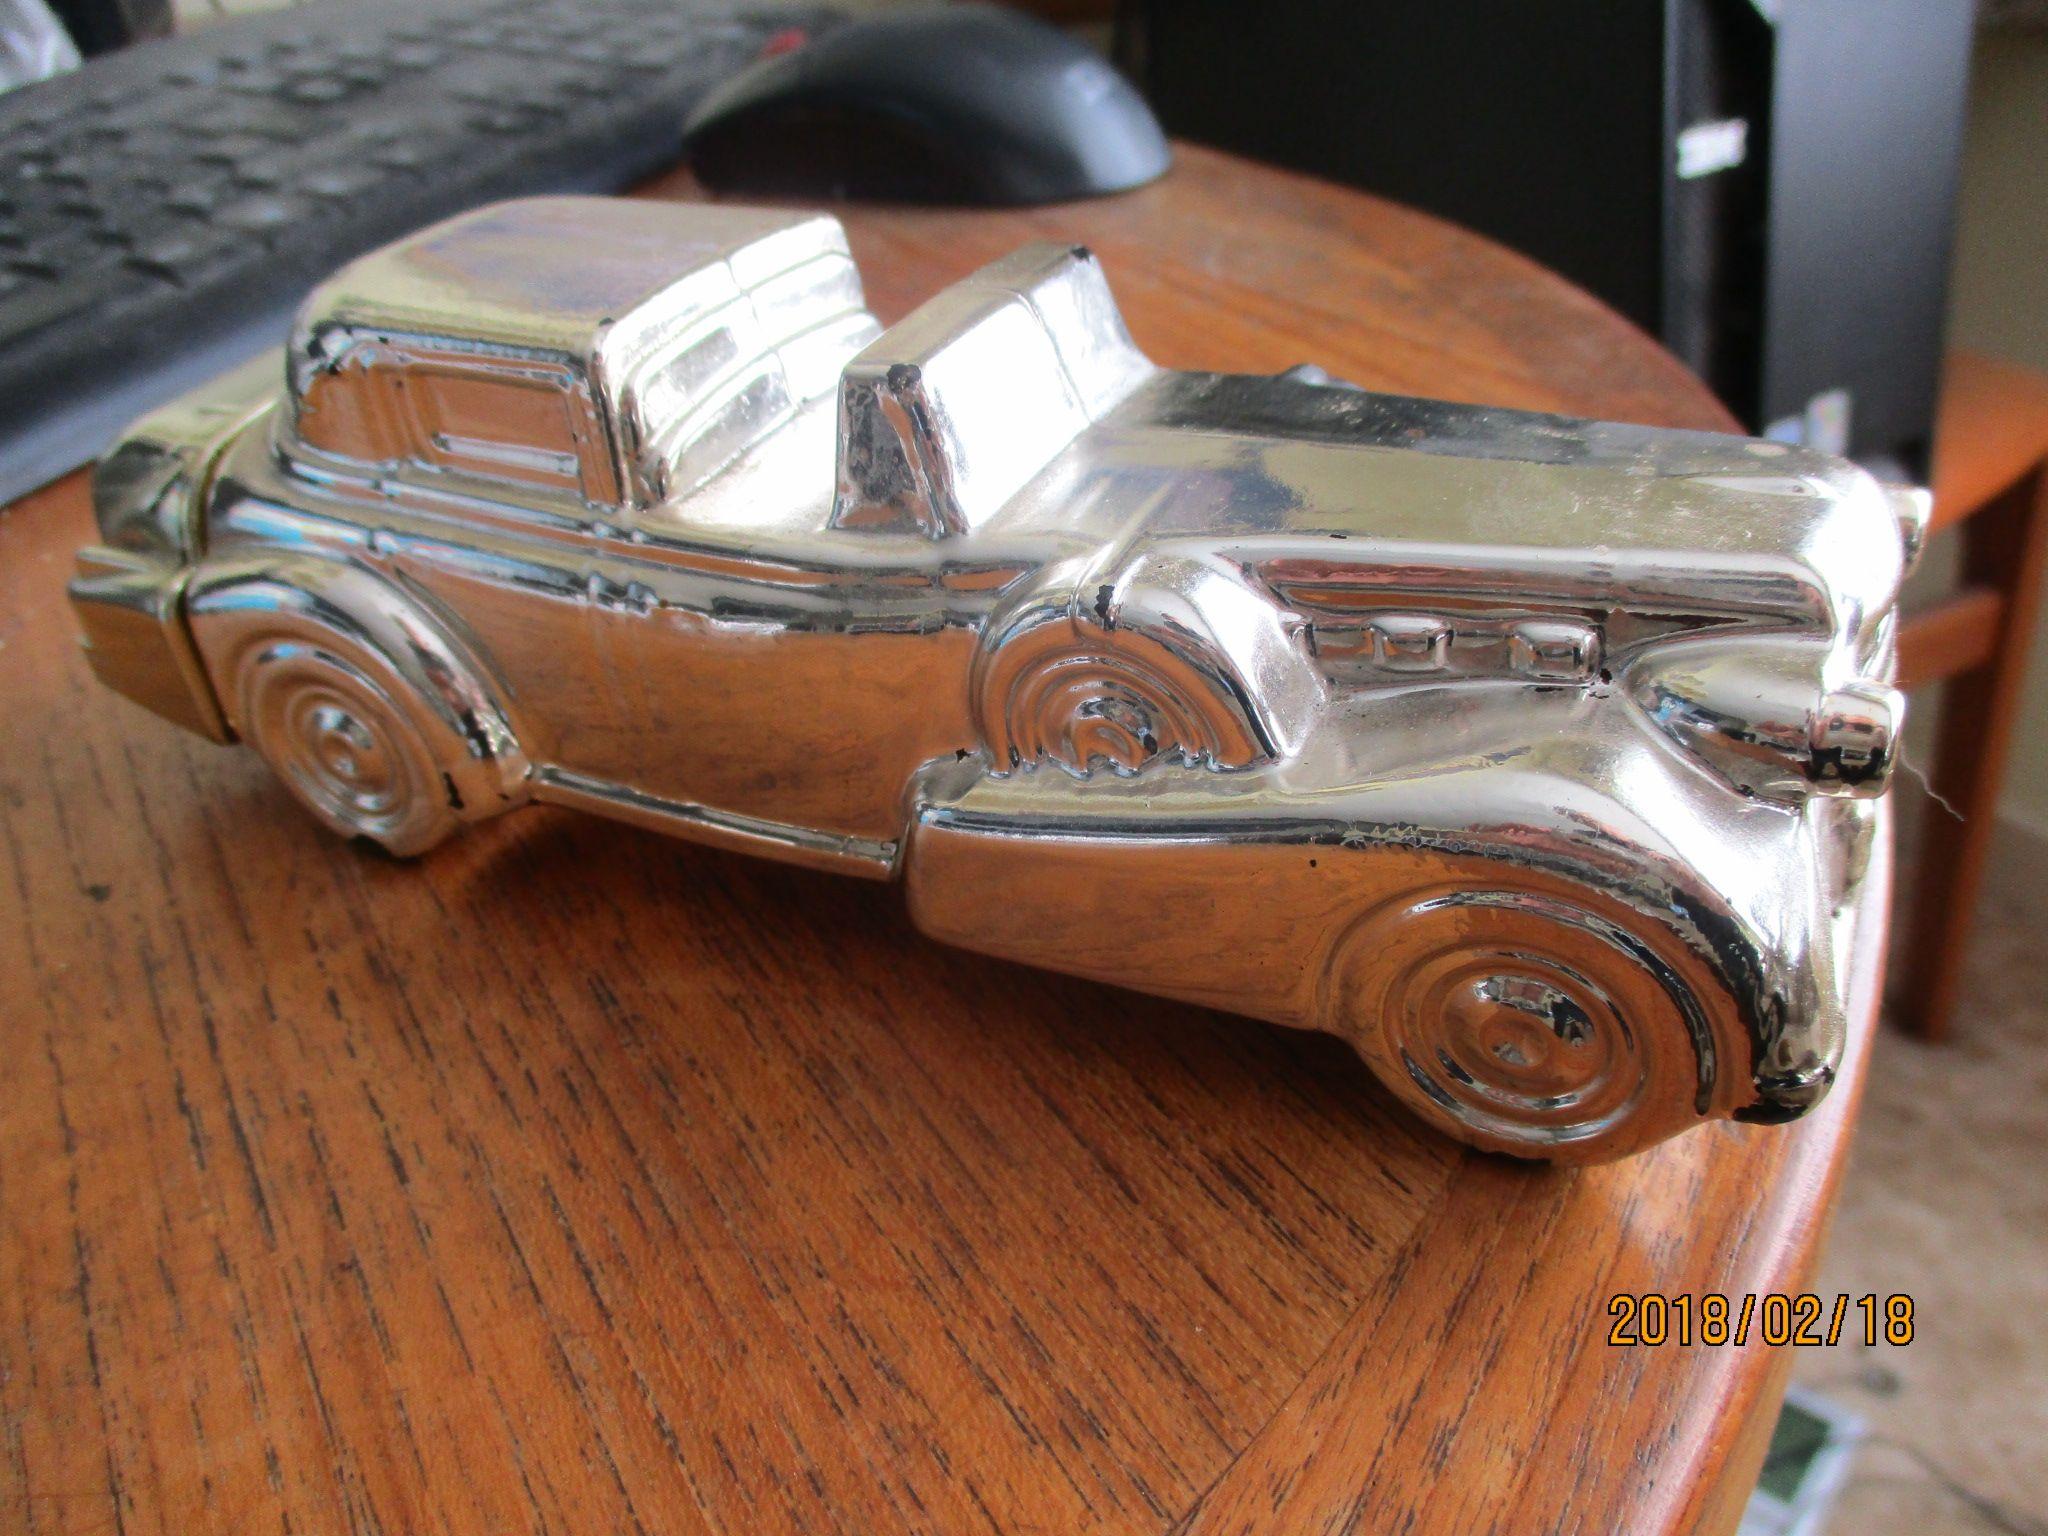 1933 Cadillac Gold Avon Bottle Kingeldo S Tiny Cadillacs